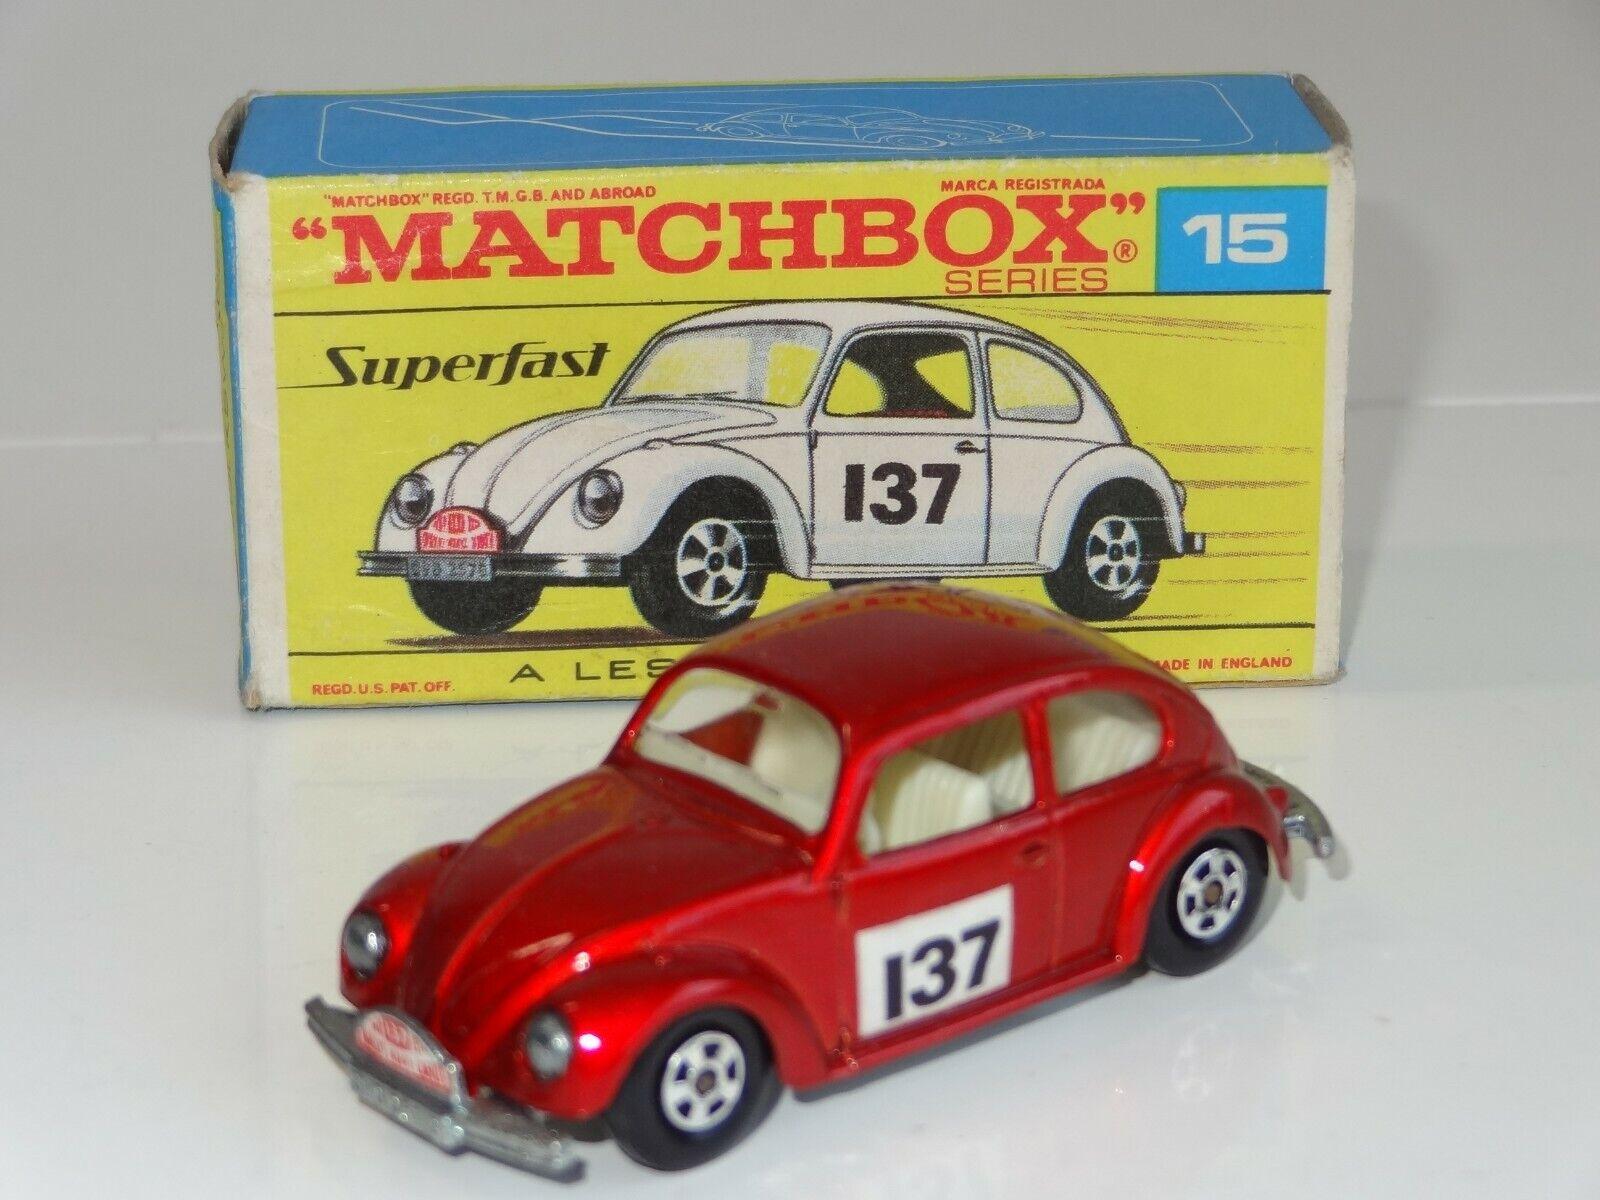 (B) Matchbox súperfast VW Volkswagen EsCocheabajo Monte Cochelo rallye - 15 Caja Raro